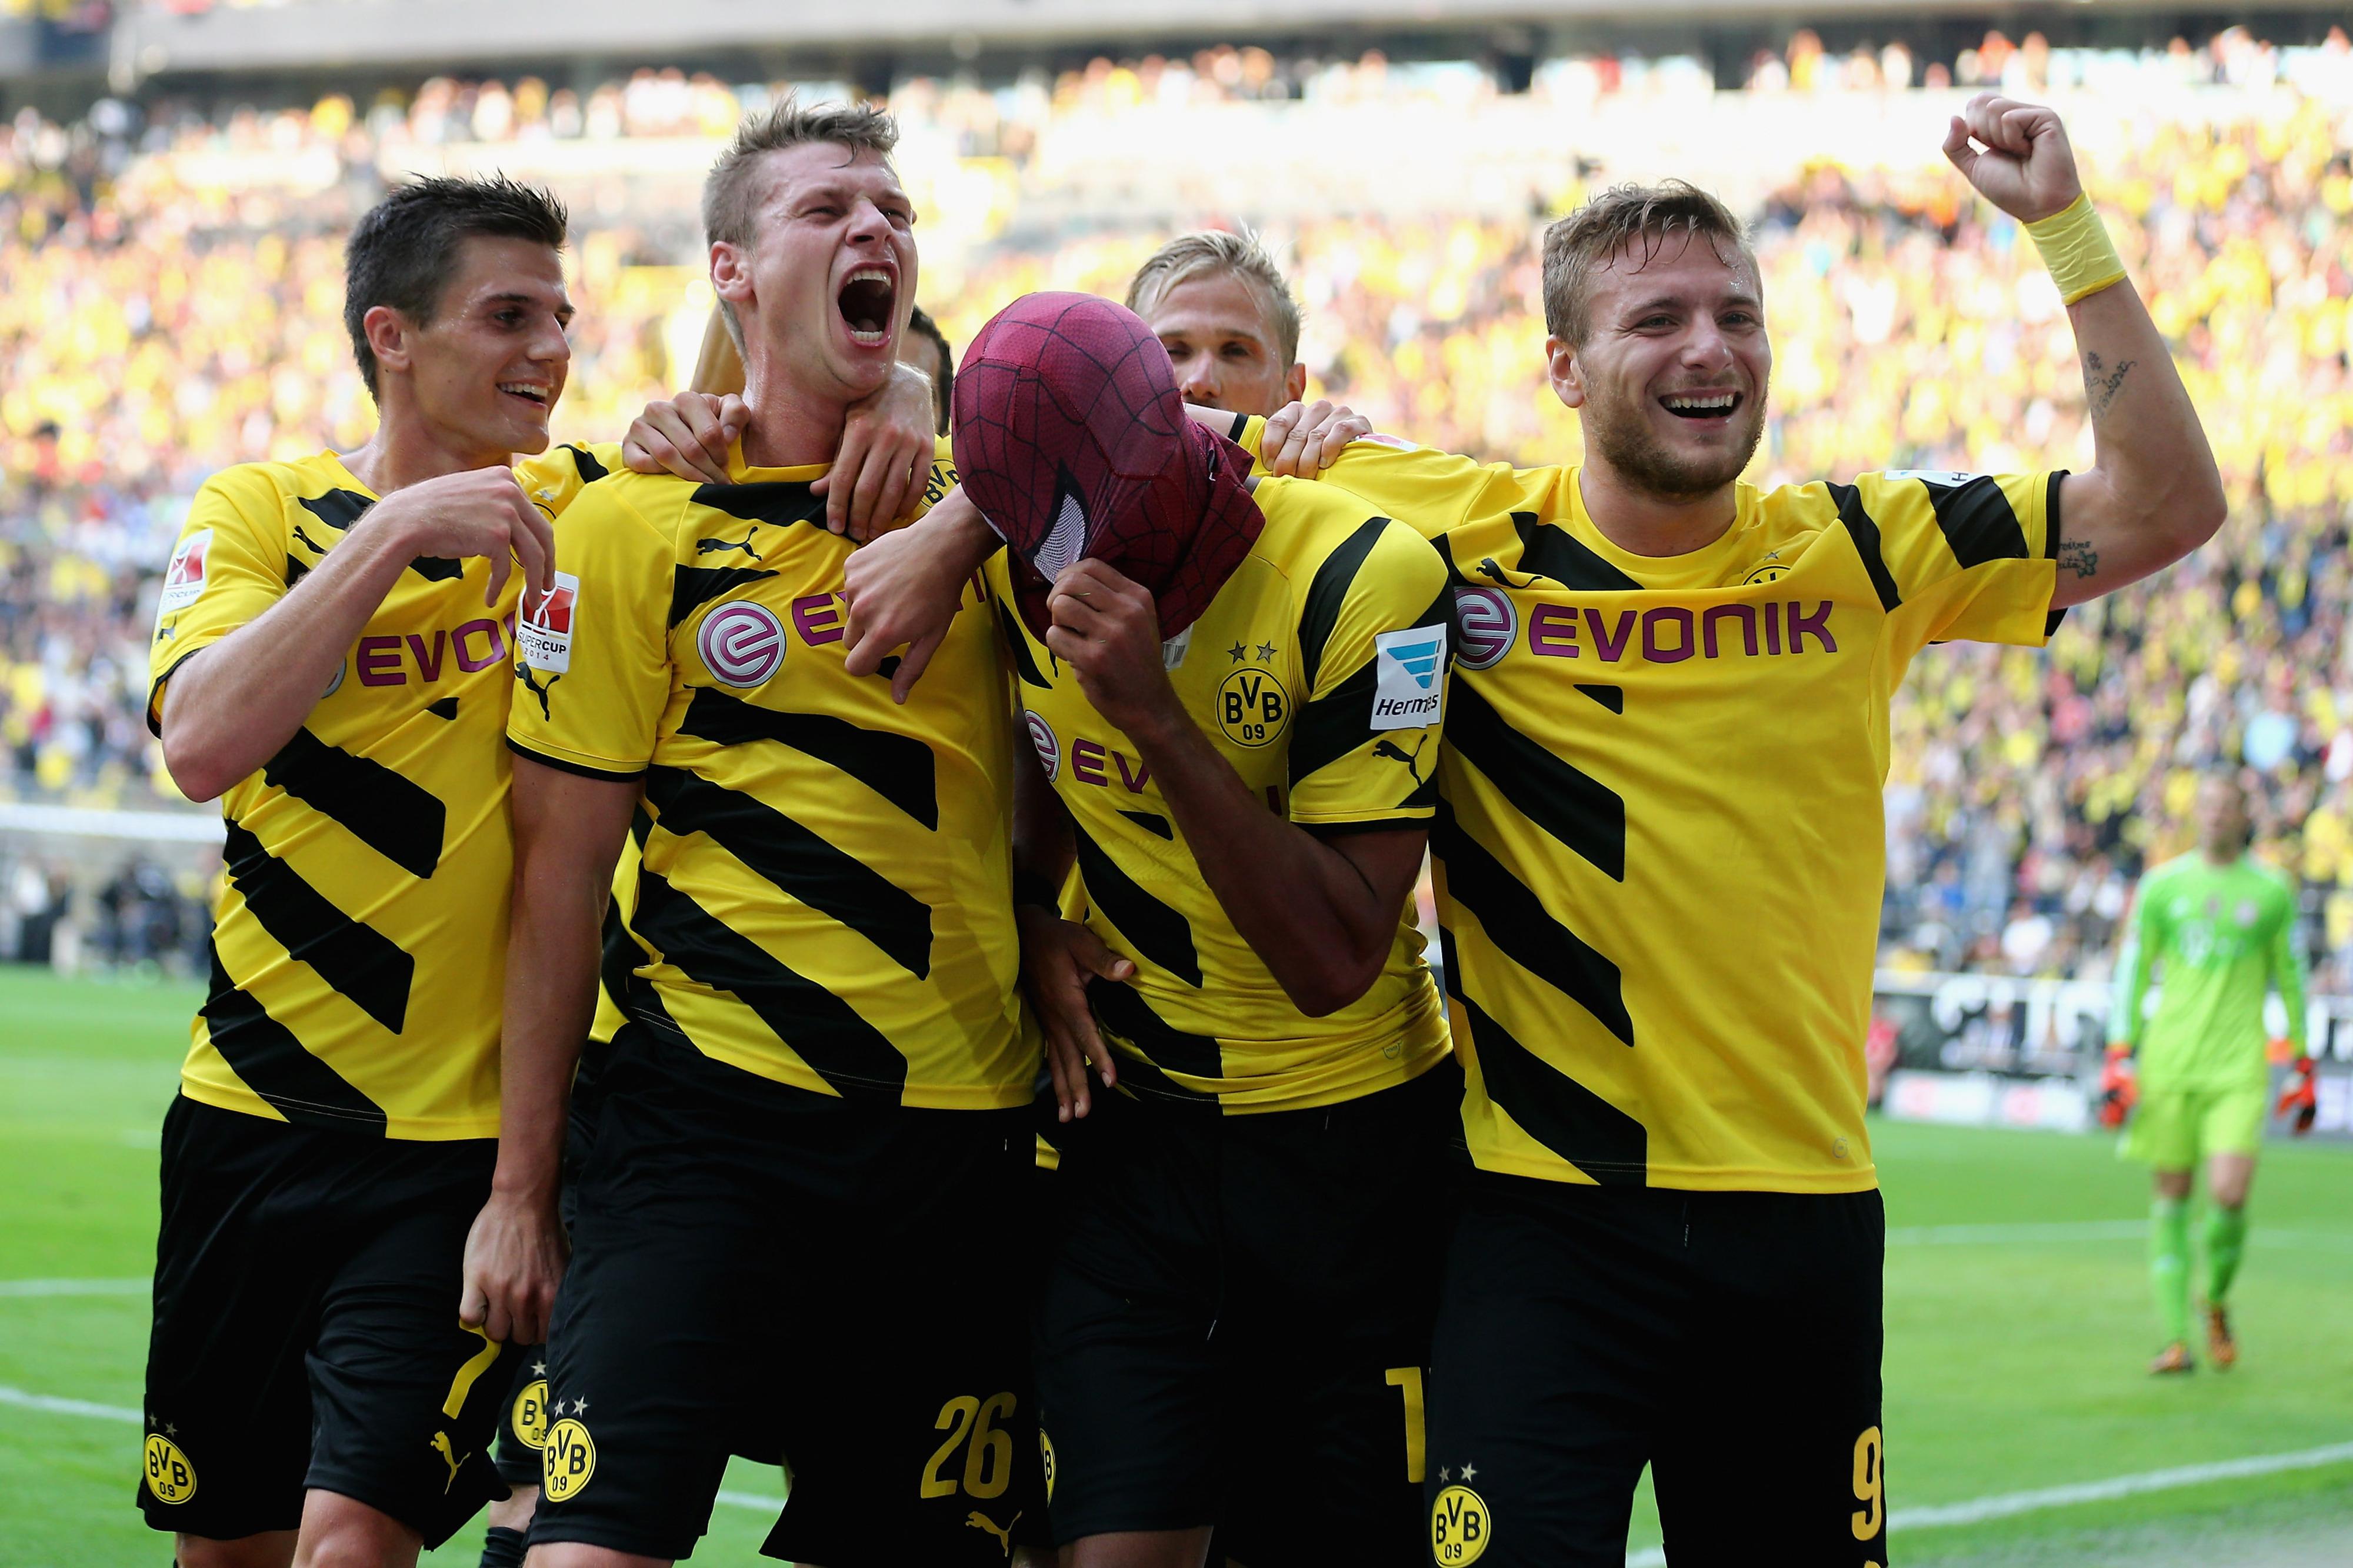 Borussia Dortmund vs. Bayern Munich: Final score 2-0, BVB comfortably win DFL-Supercup